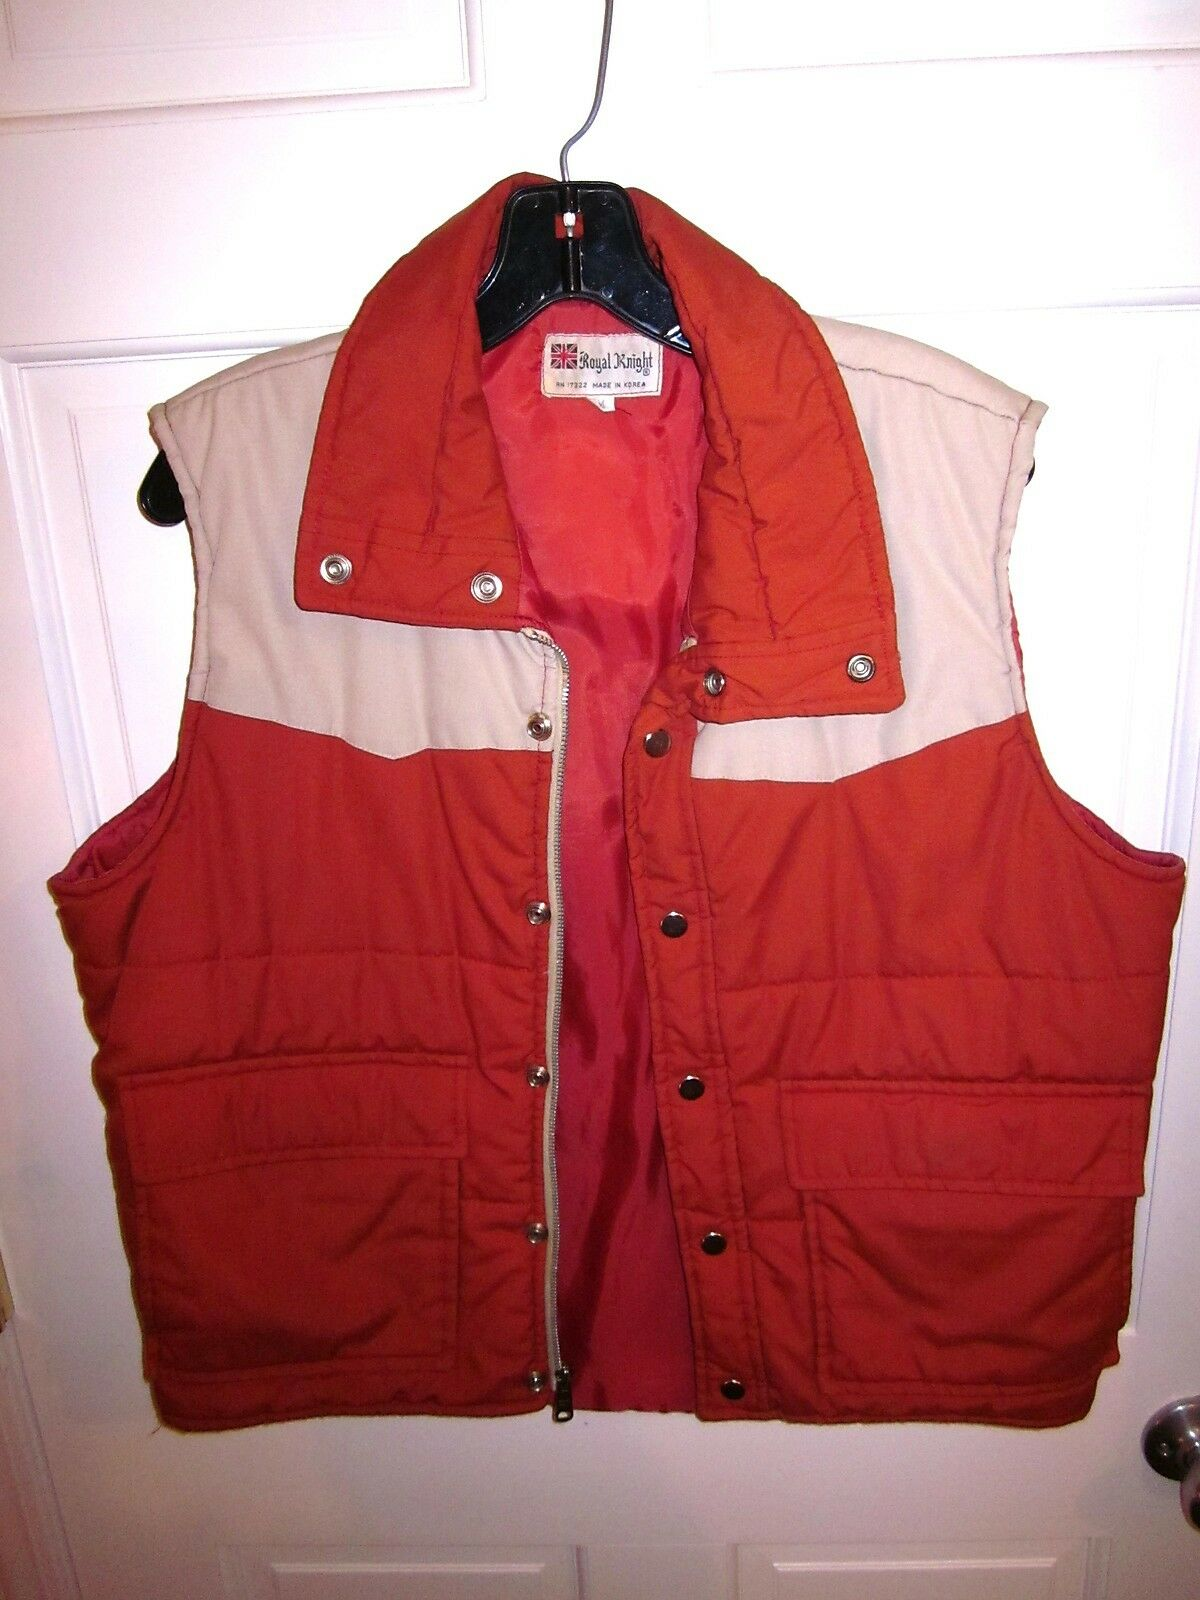 ROYAL KNIGHT men's outdoors vest med 1970s western yoke orange hunting hiking